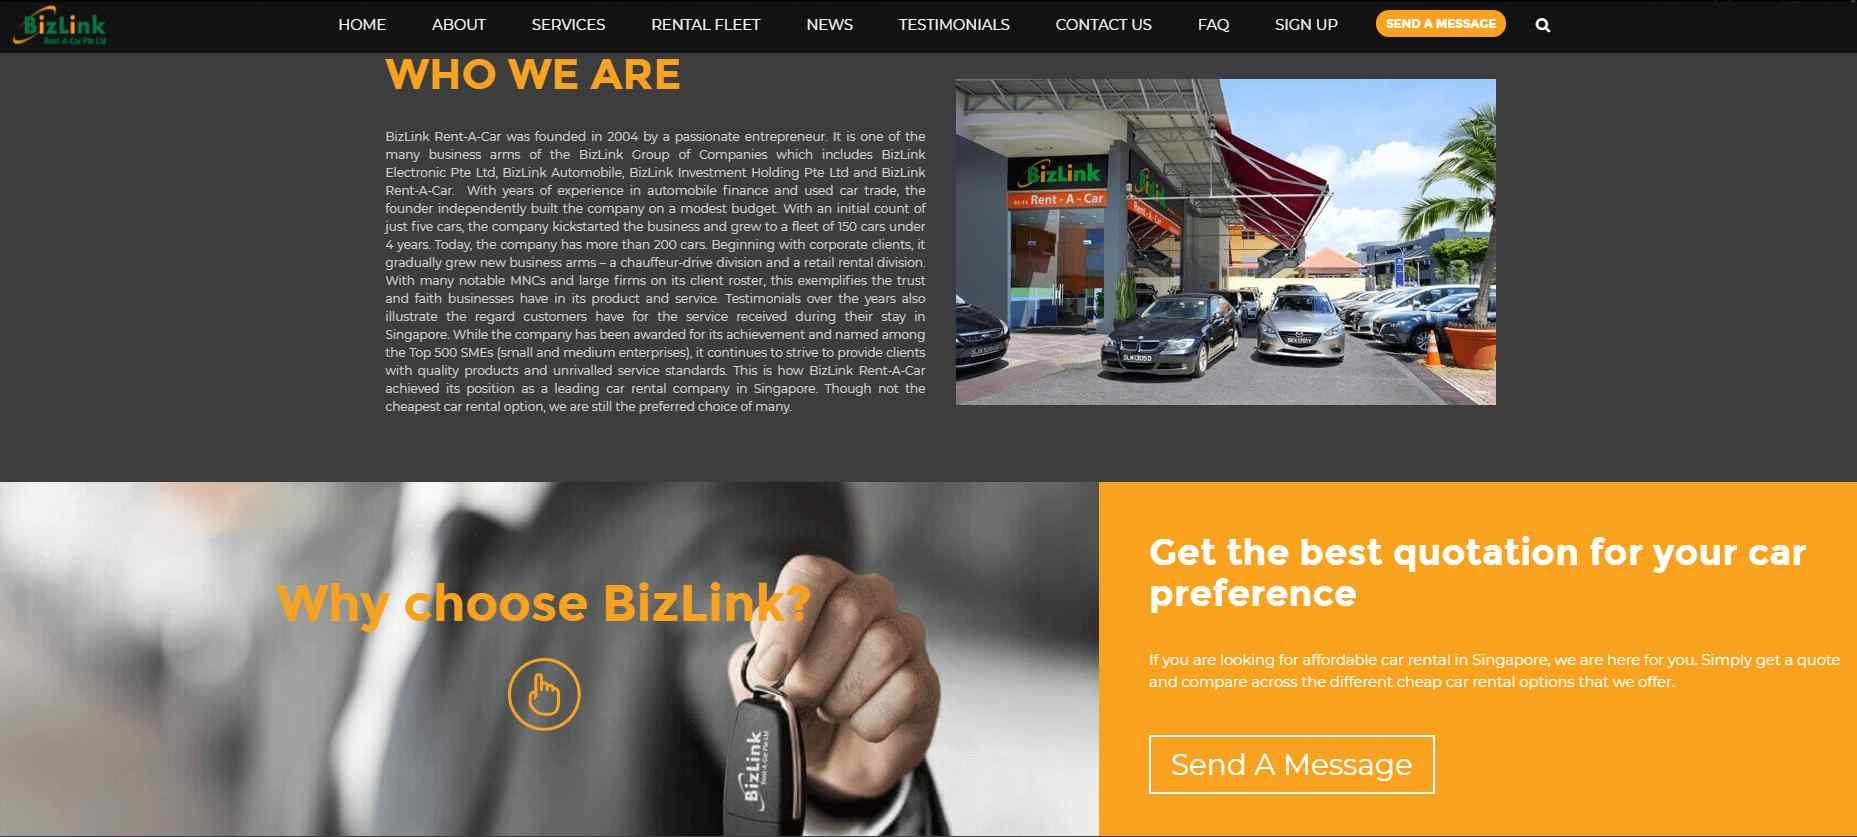 biz link rent a car Top Luxury Car Rental Services in Singapore